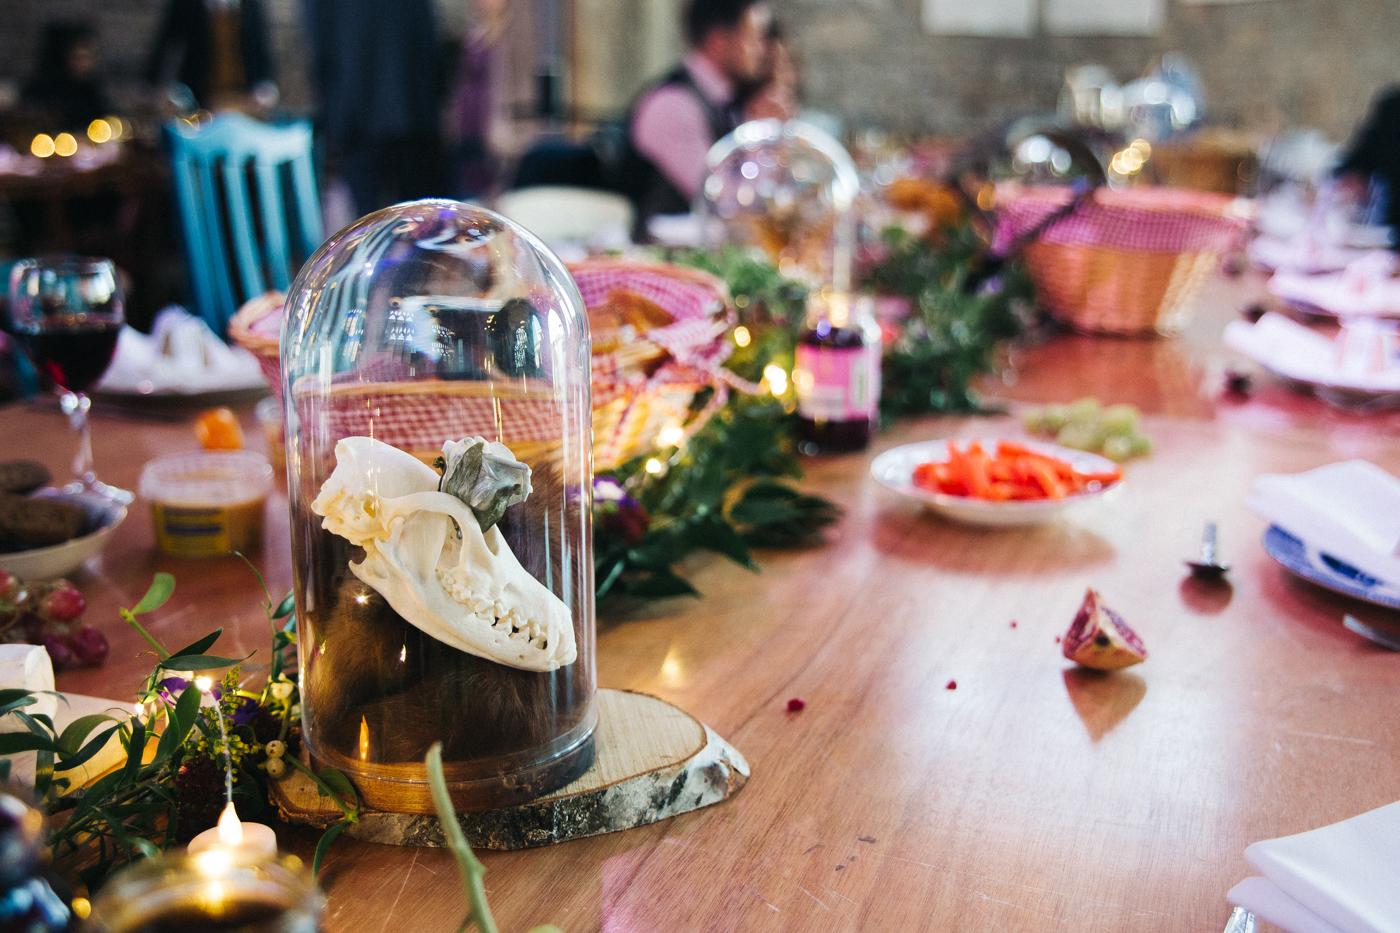 teesside-newcastle-gateshead-wedding-photography-photographer-creative-0056.jpg